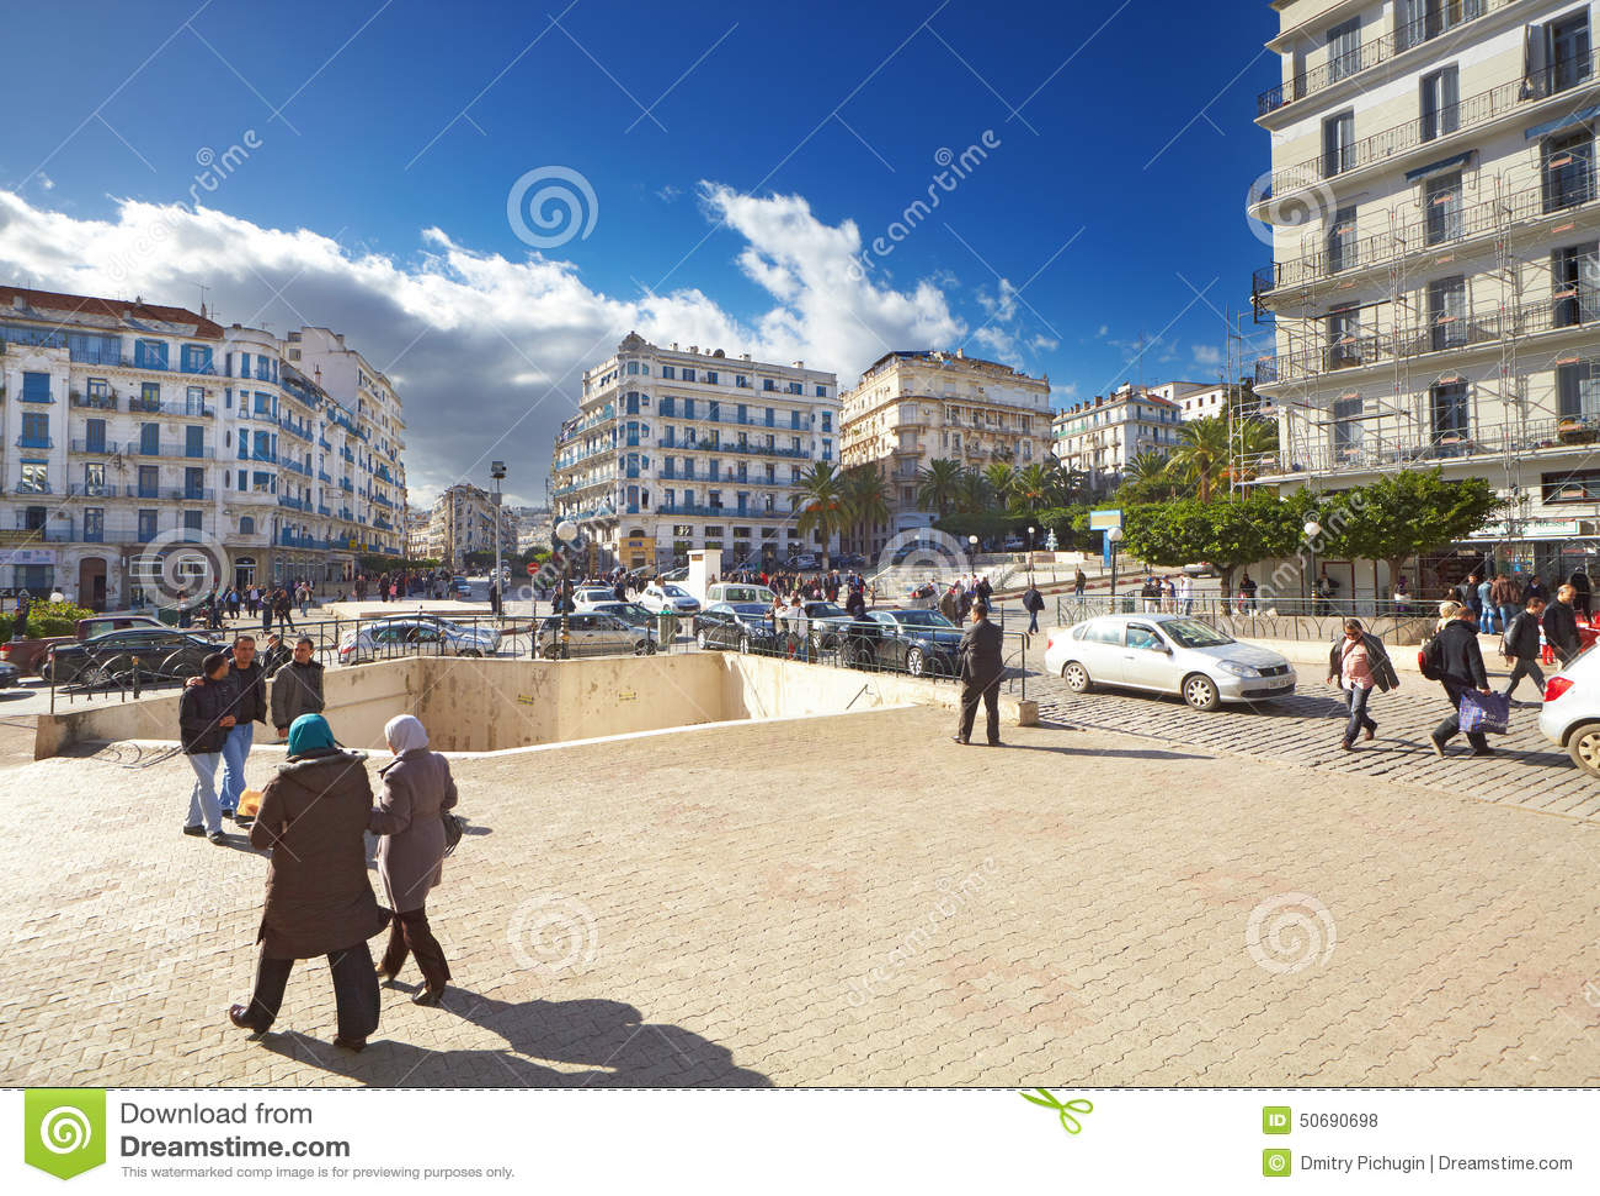 Download 阿尔及尔市,阿尔及利亚中央街道 编辑类库存照片. 图片 包括有 阿尔及尔, 都市风景, 蓝色, 多数, 资本 - 50690698